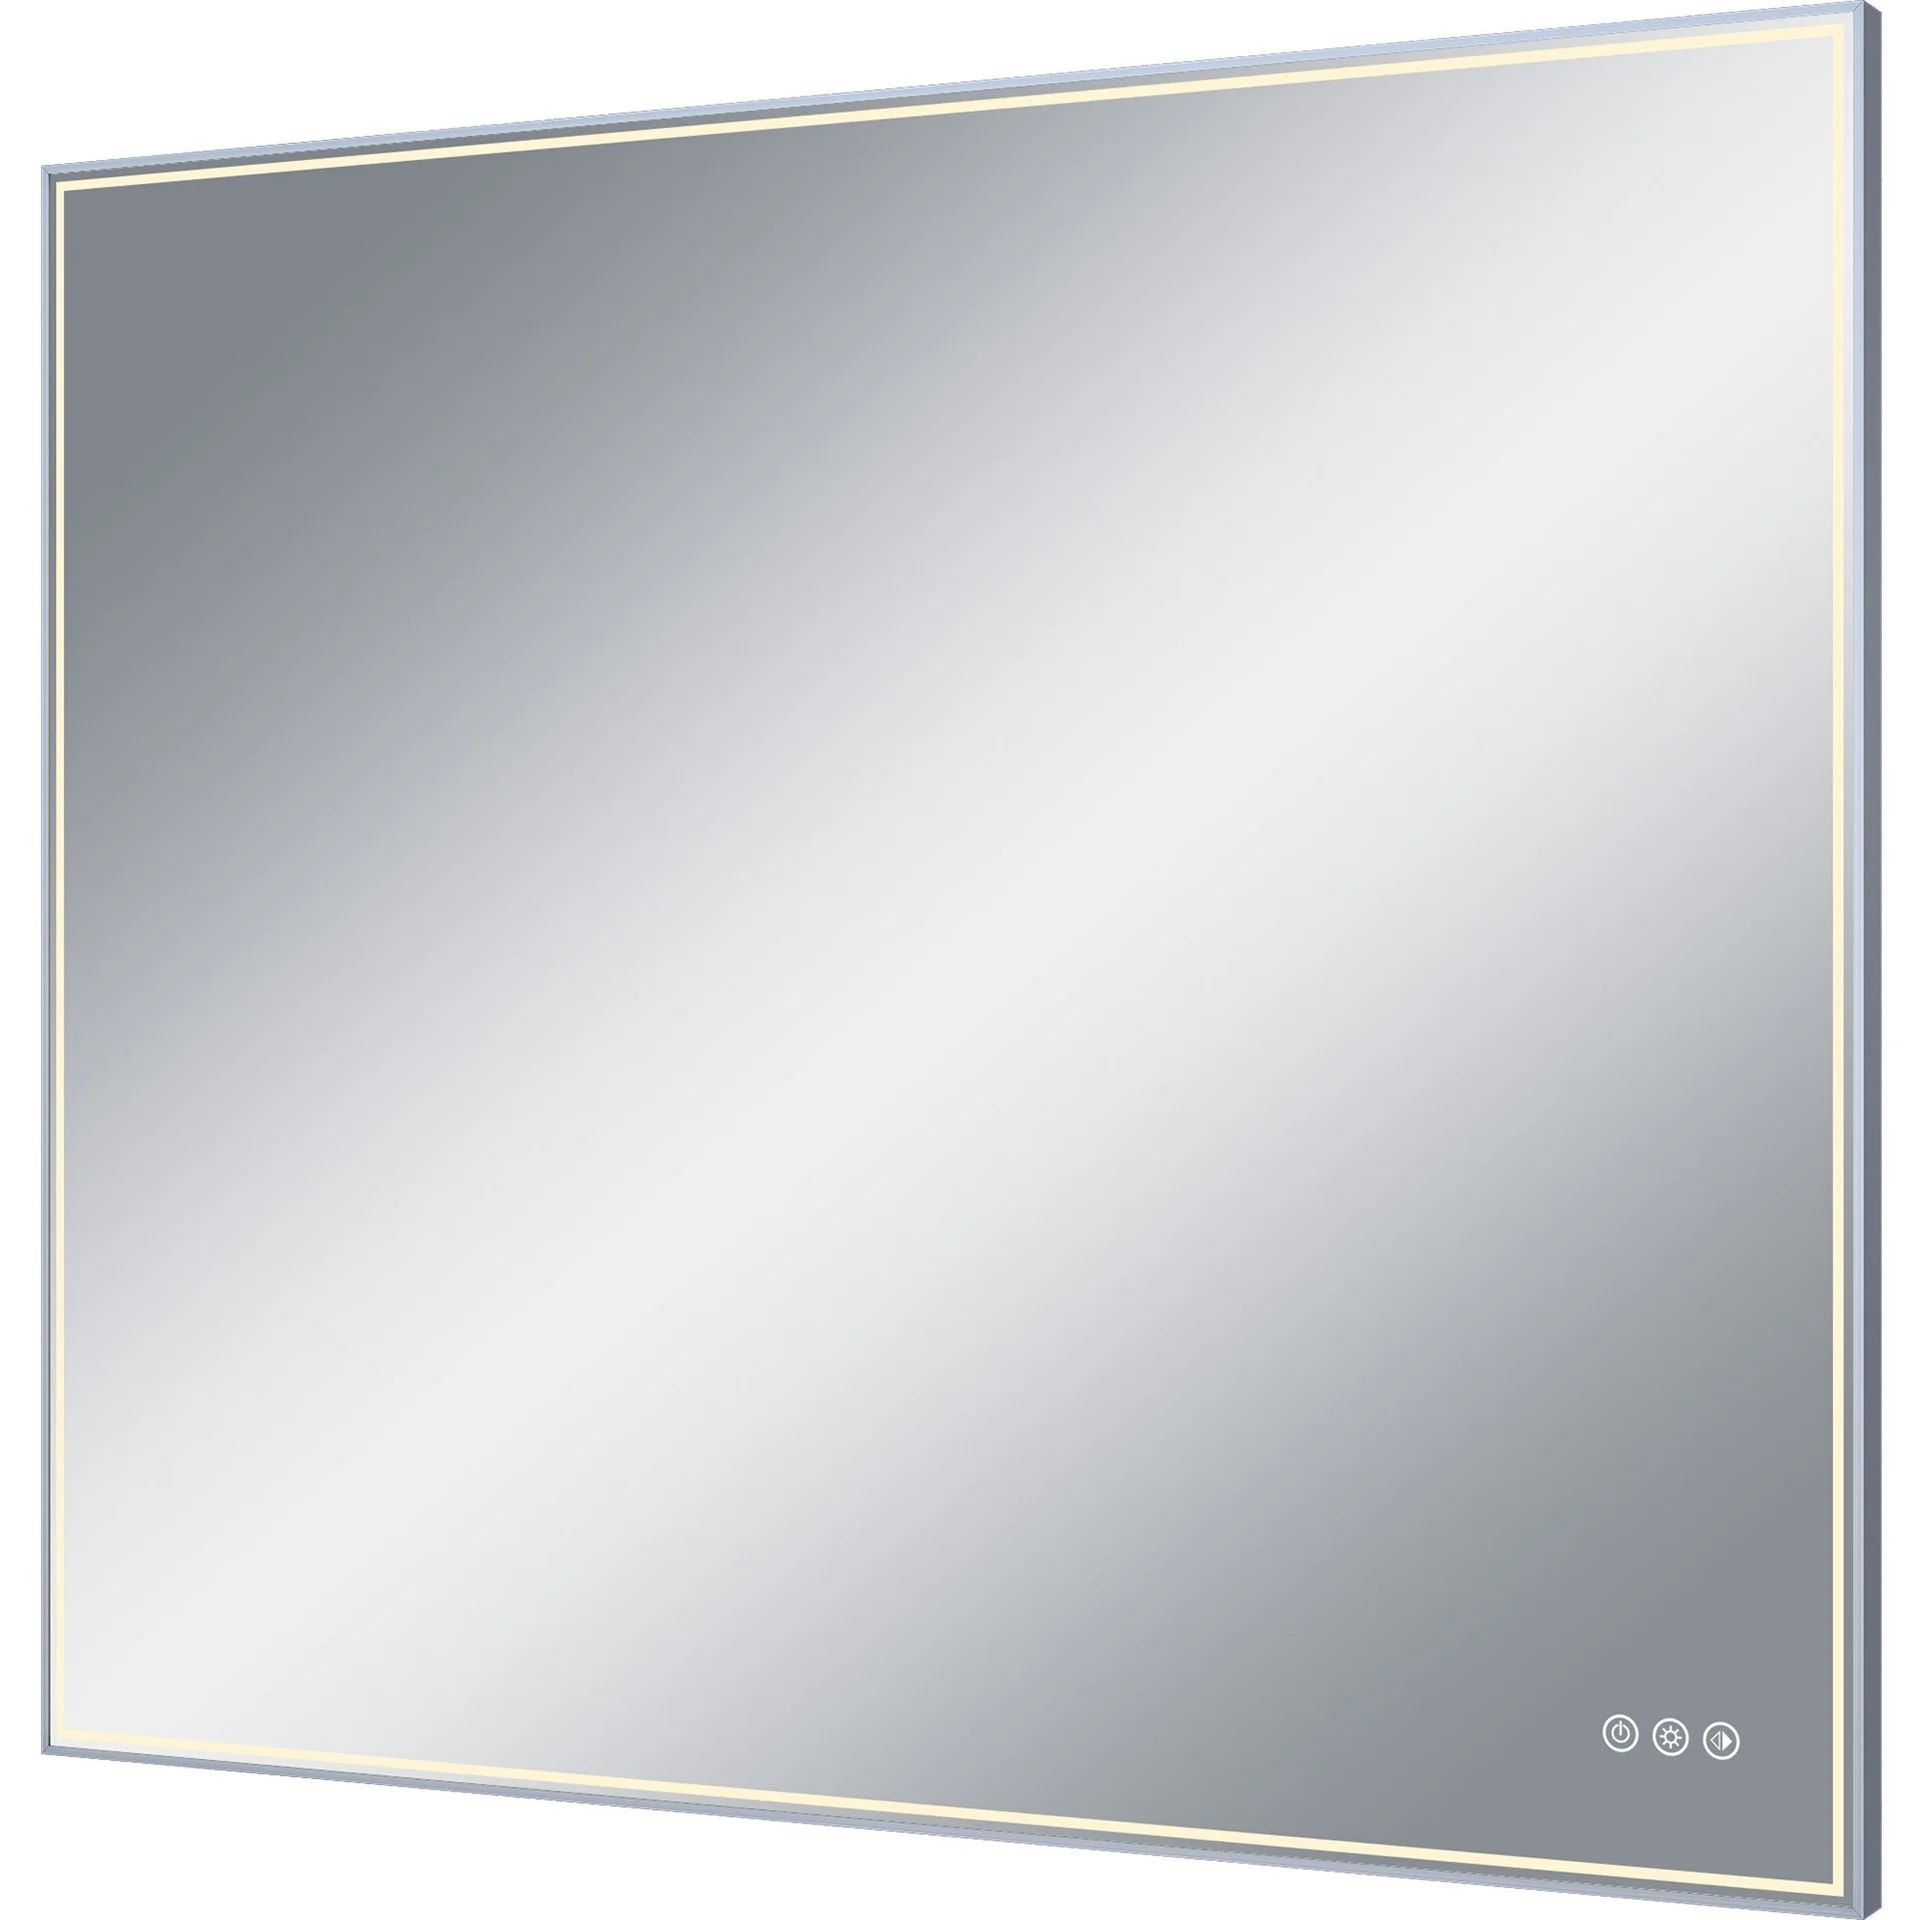 Miroir Lumineux Avec Eclairage Integre L 105 X H 90 Cm Neo Leroy Merlin